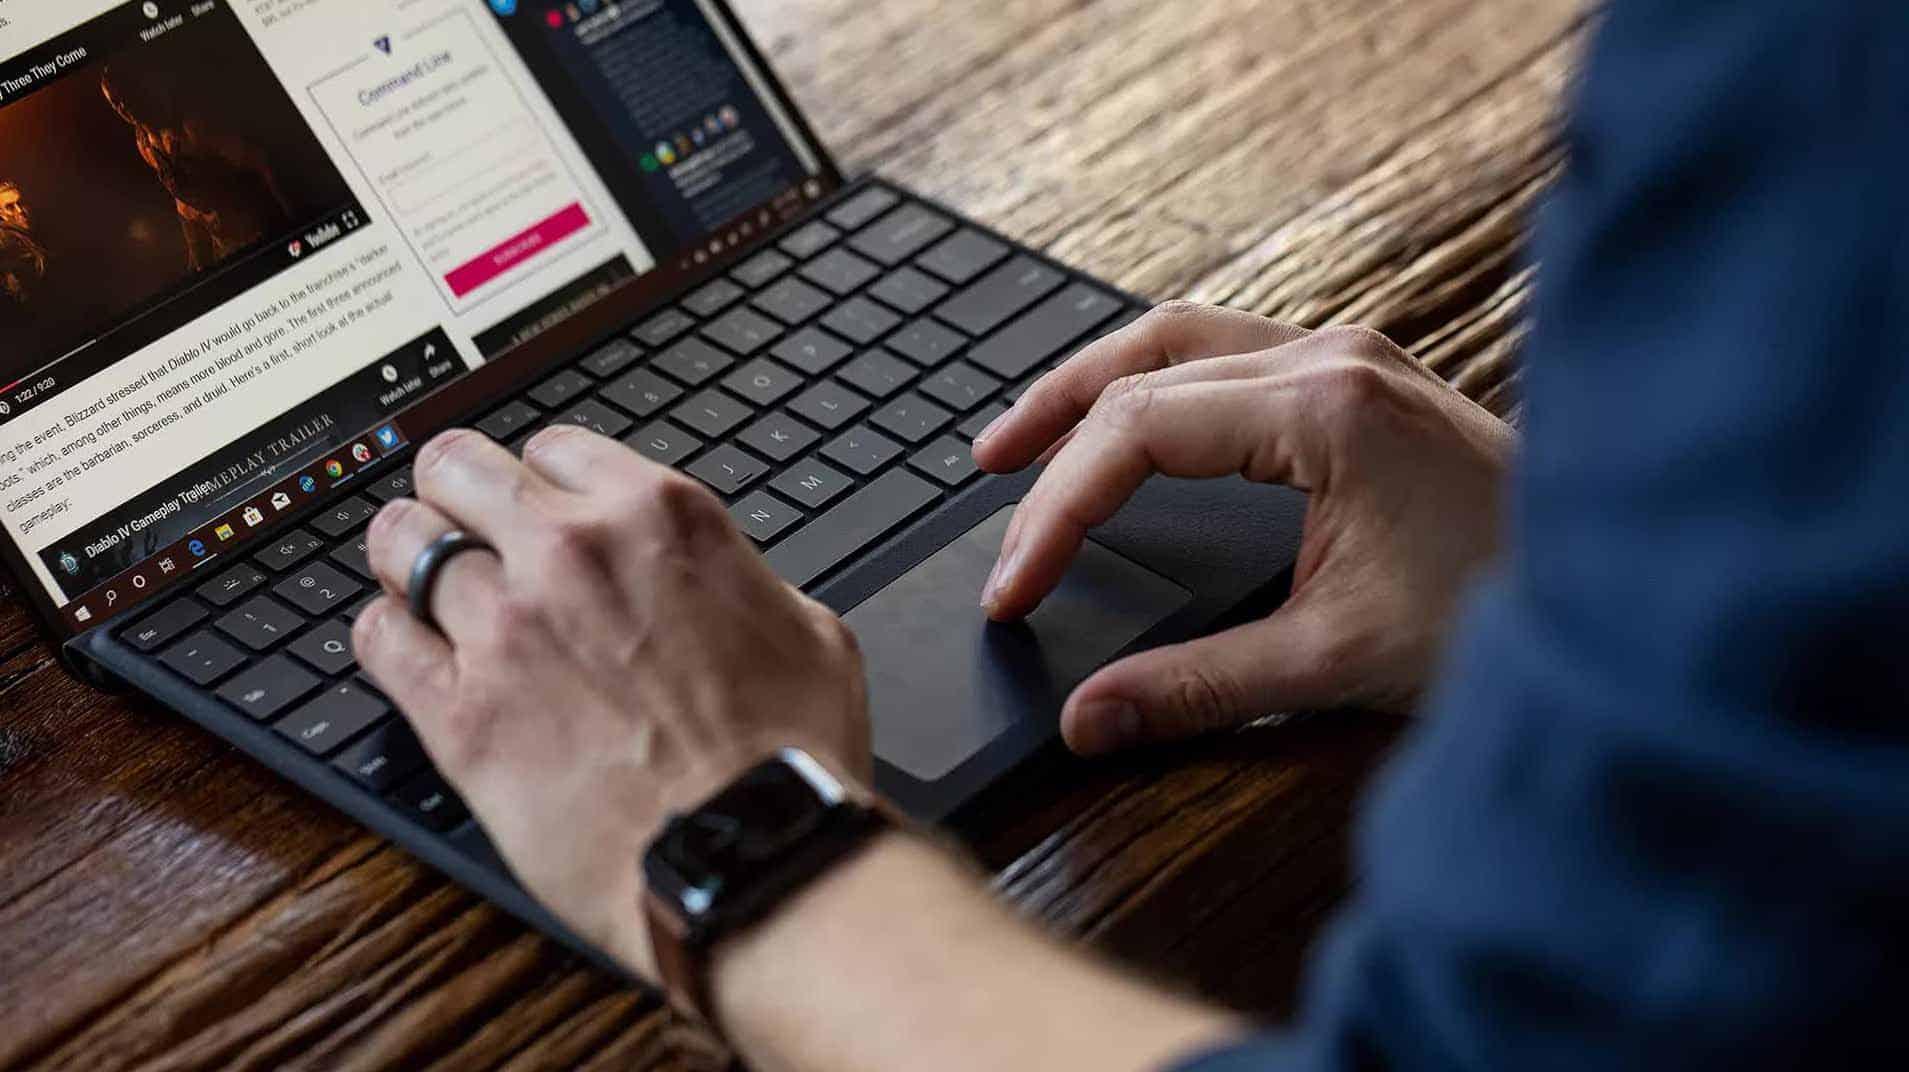 su-dung-surface-pro-x-keyboard-slim-pen-laptopvang.com